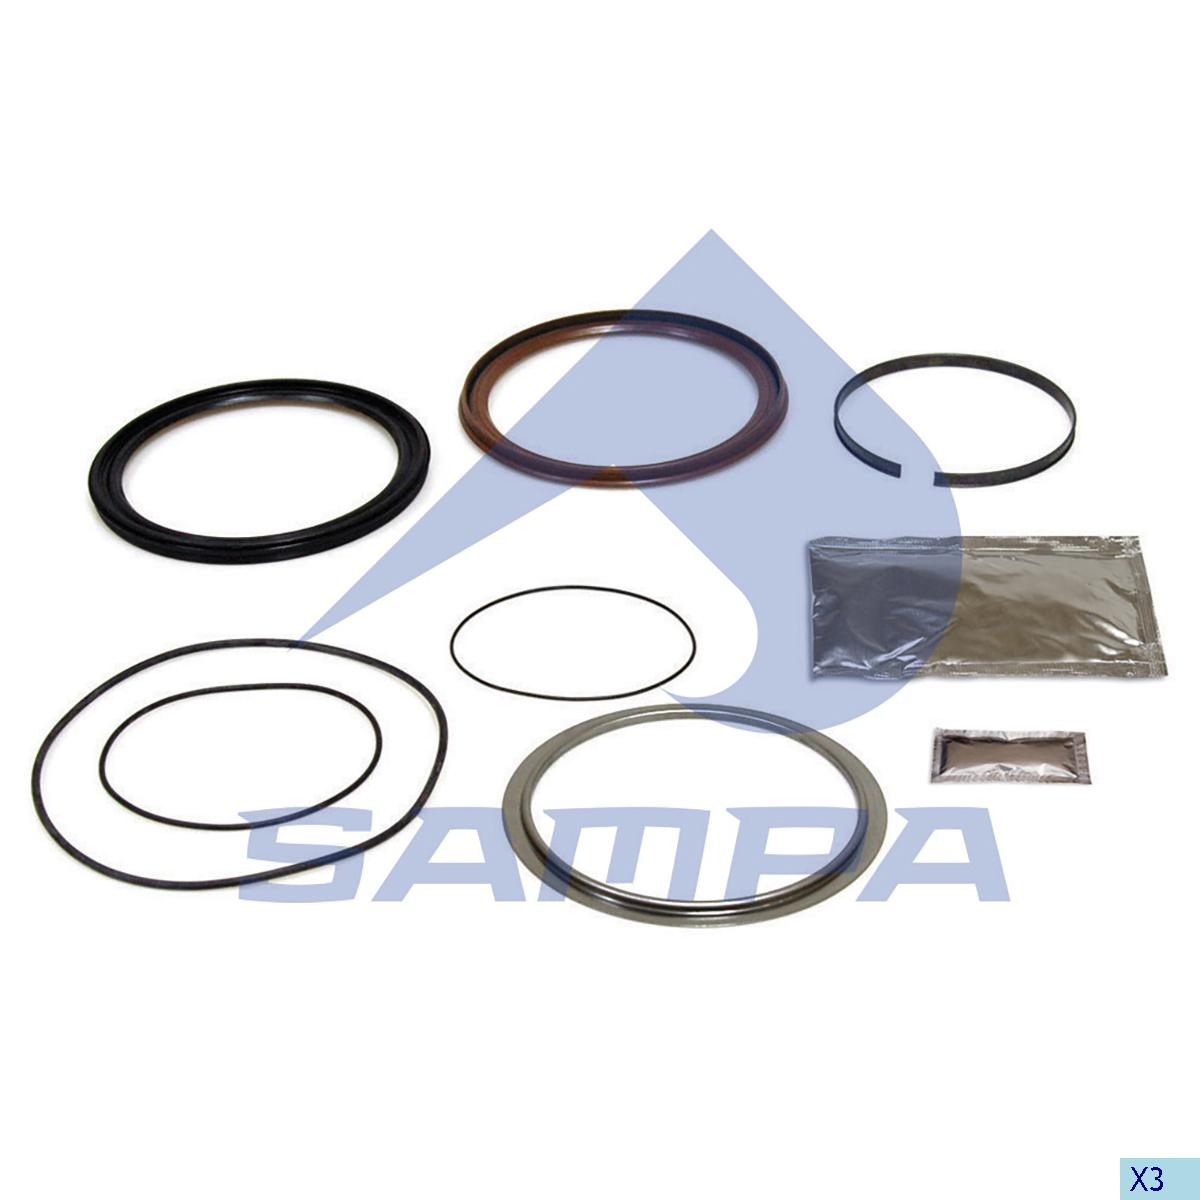 Repair Kit, Wheel Hub, Sauer, Power Unit